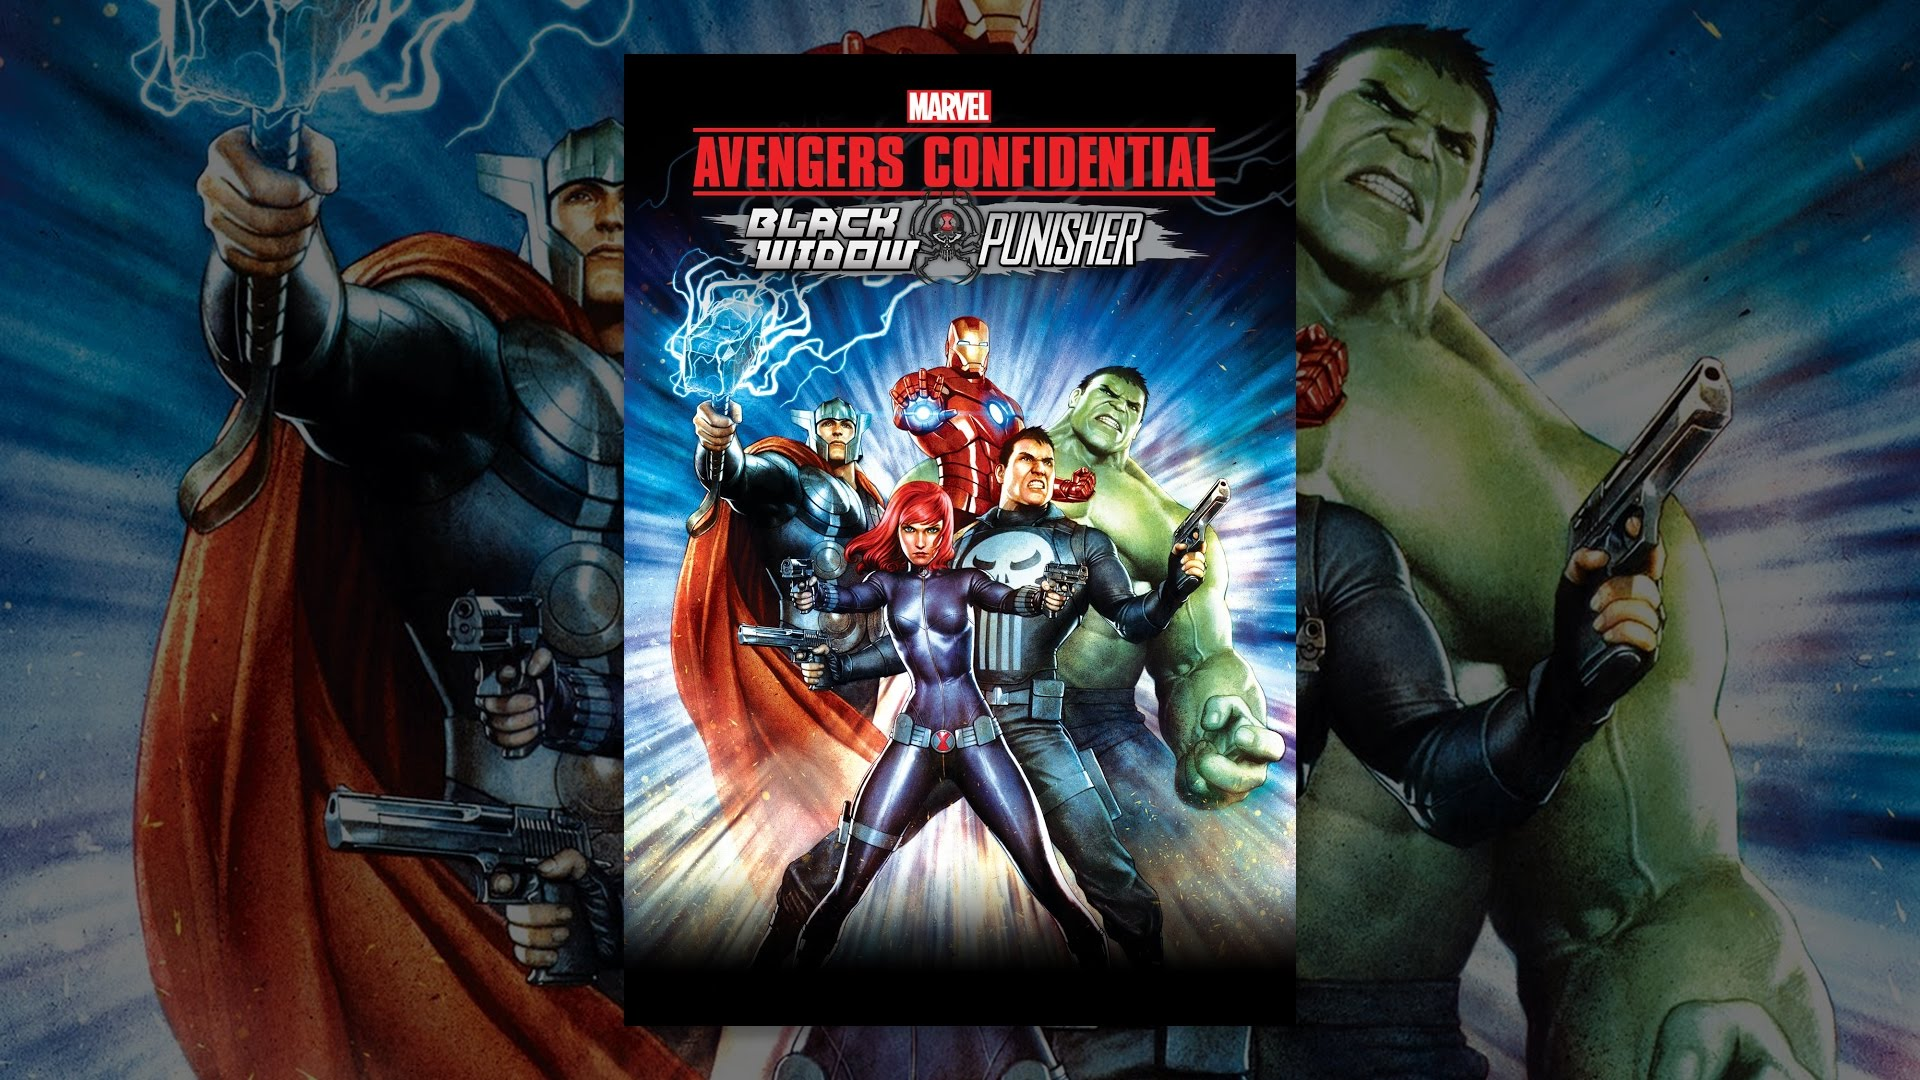 watch avengers confidential black widow punisher viooz